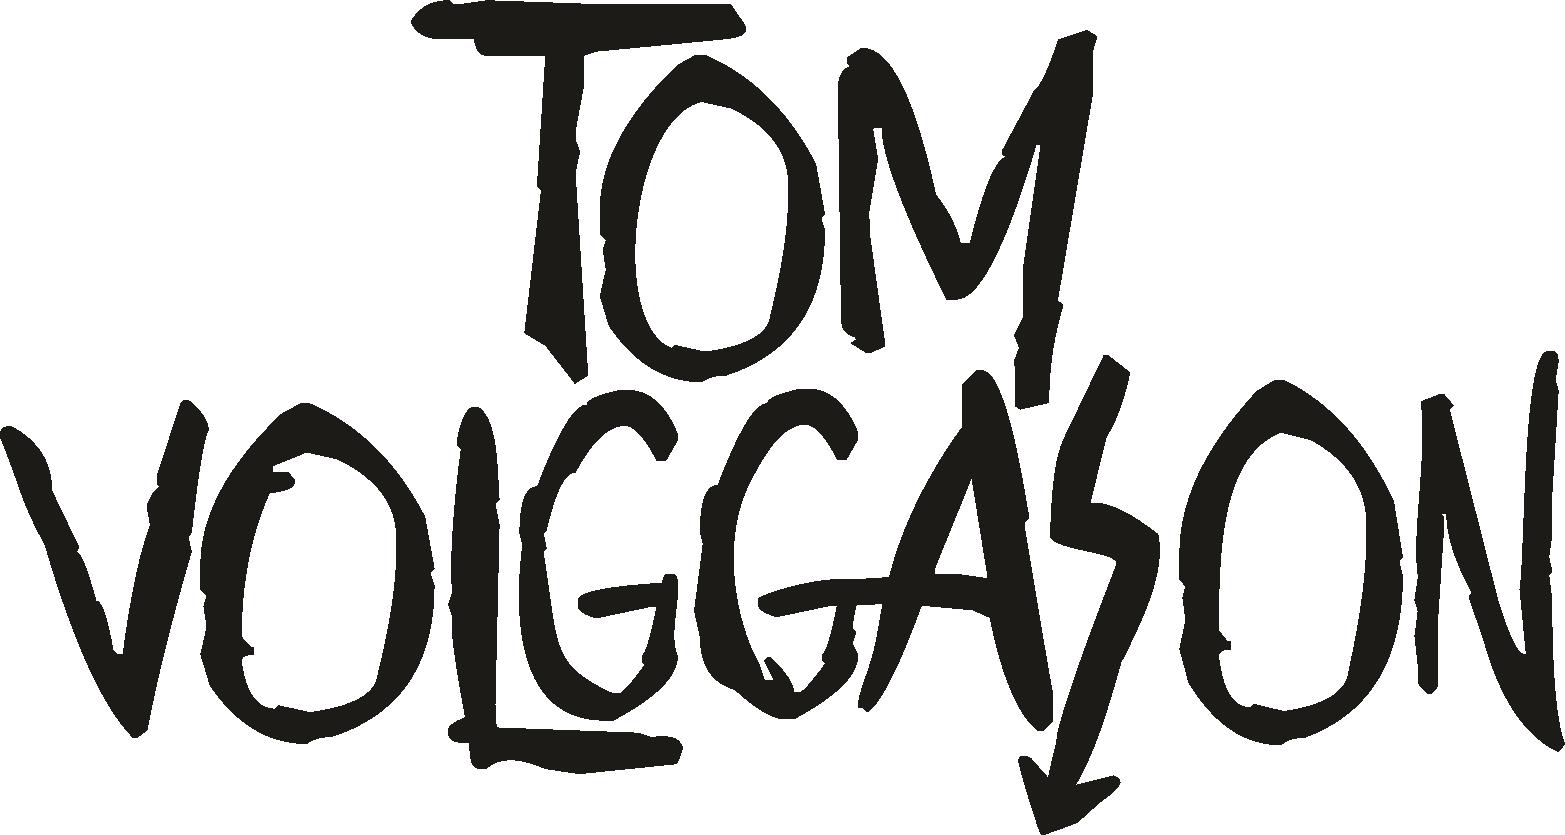 TOM VOLGGASON PHOTOGRAPHY